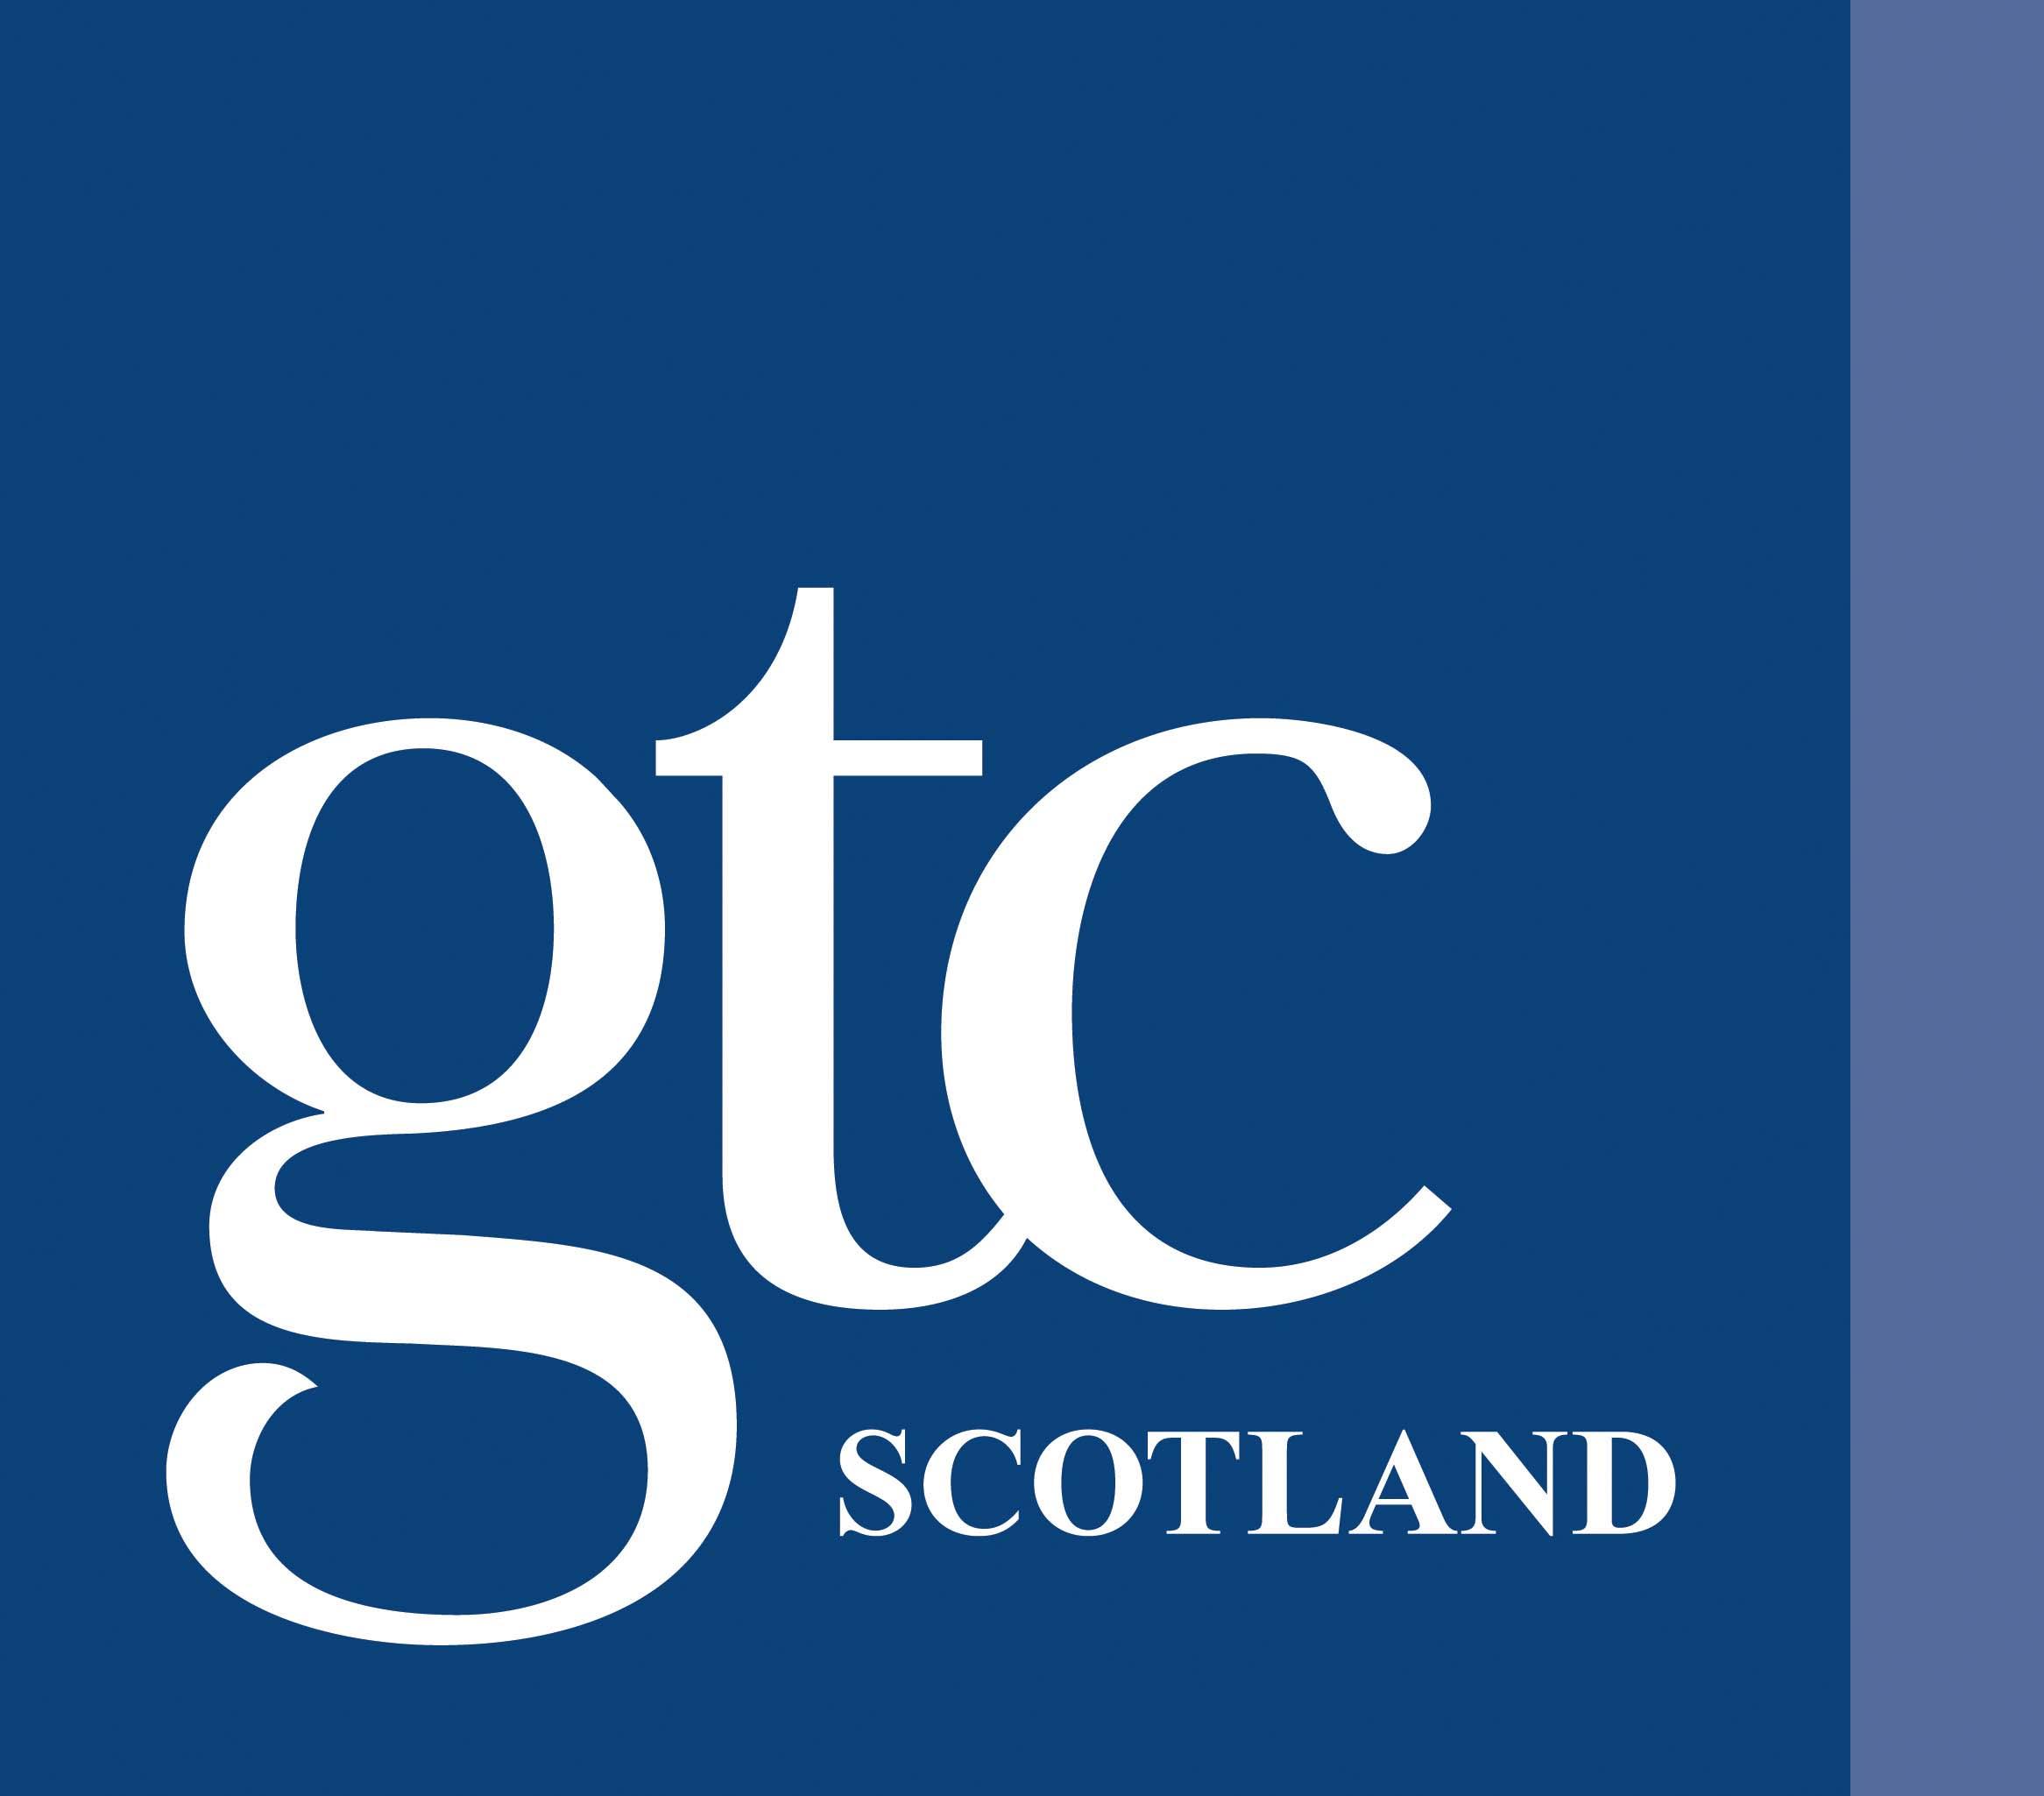 1_GTCS_logo_squ_blue_box.jpg